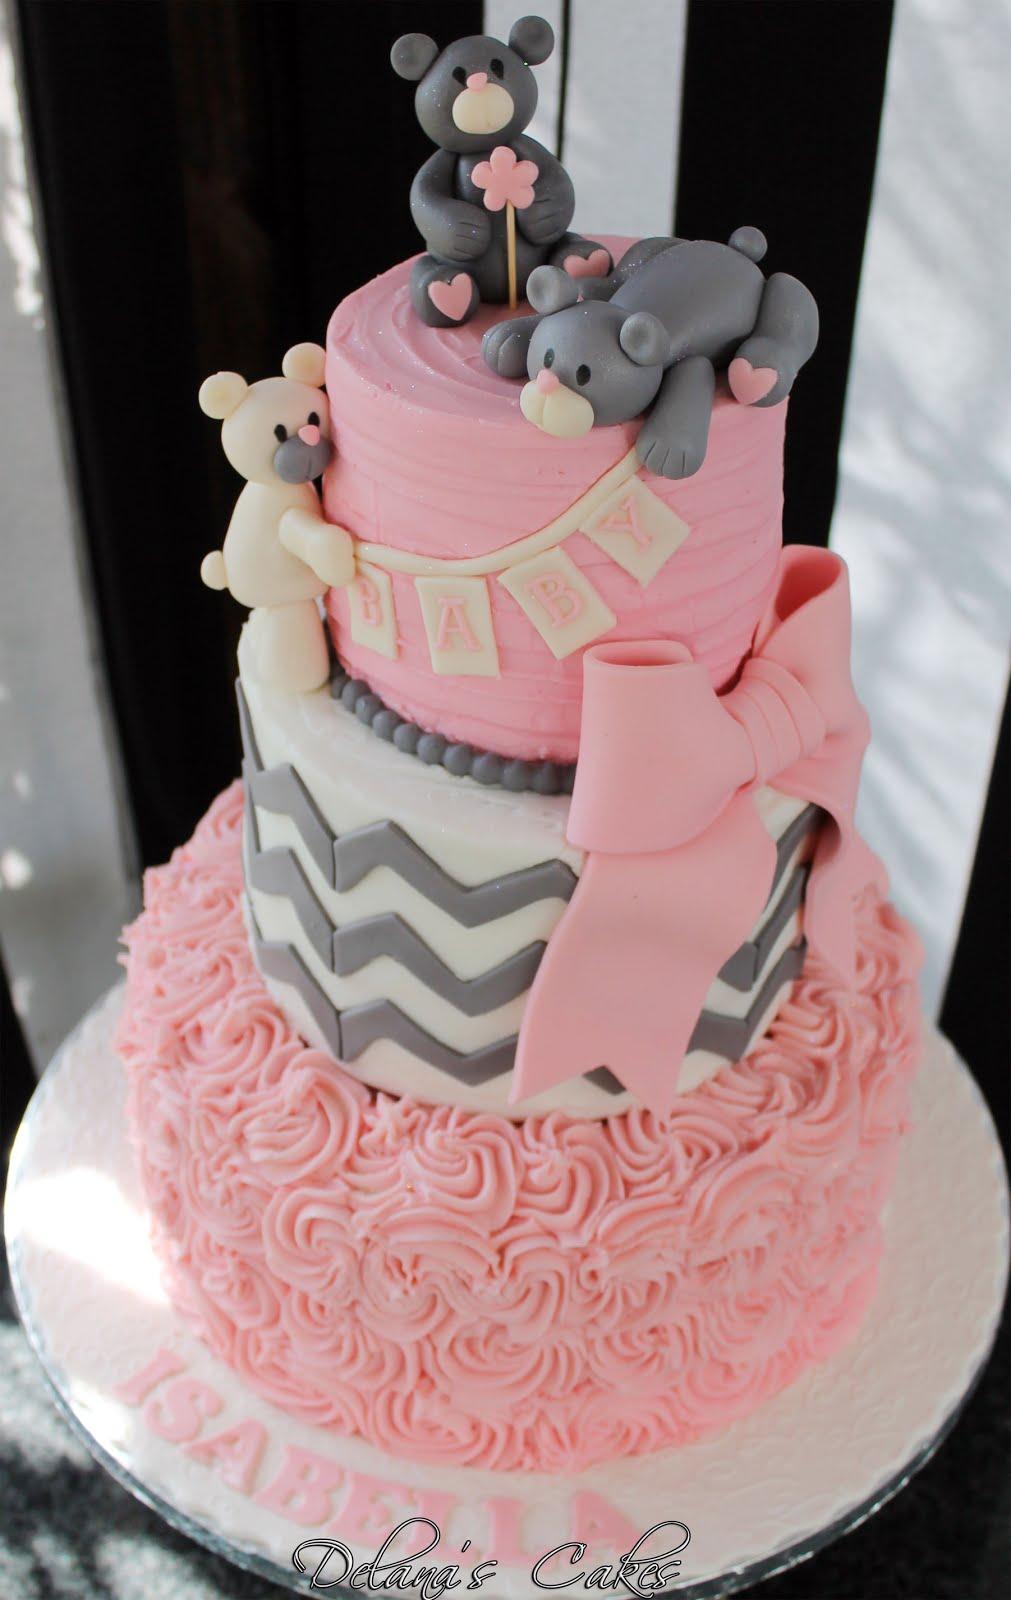 Delanas Cakes Teddy Bear Baby Shower Cake